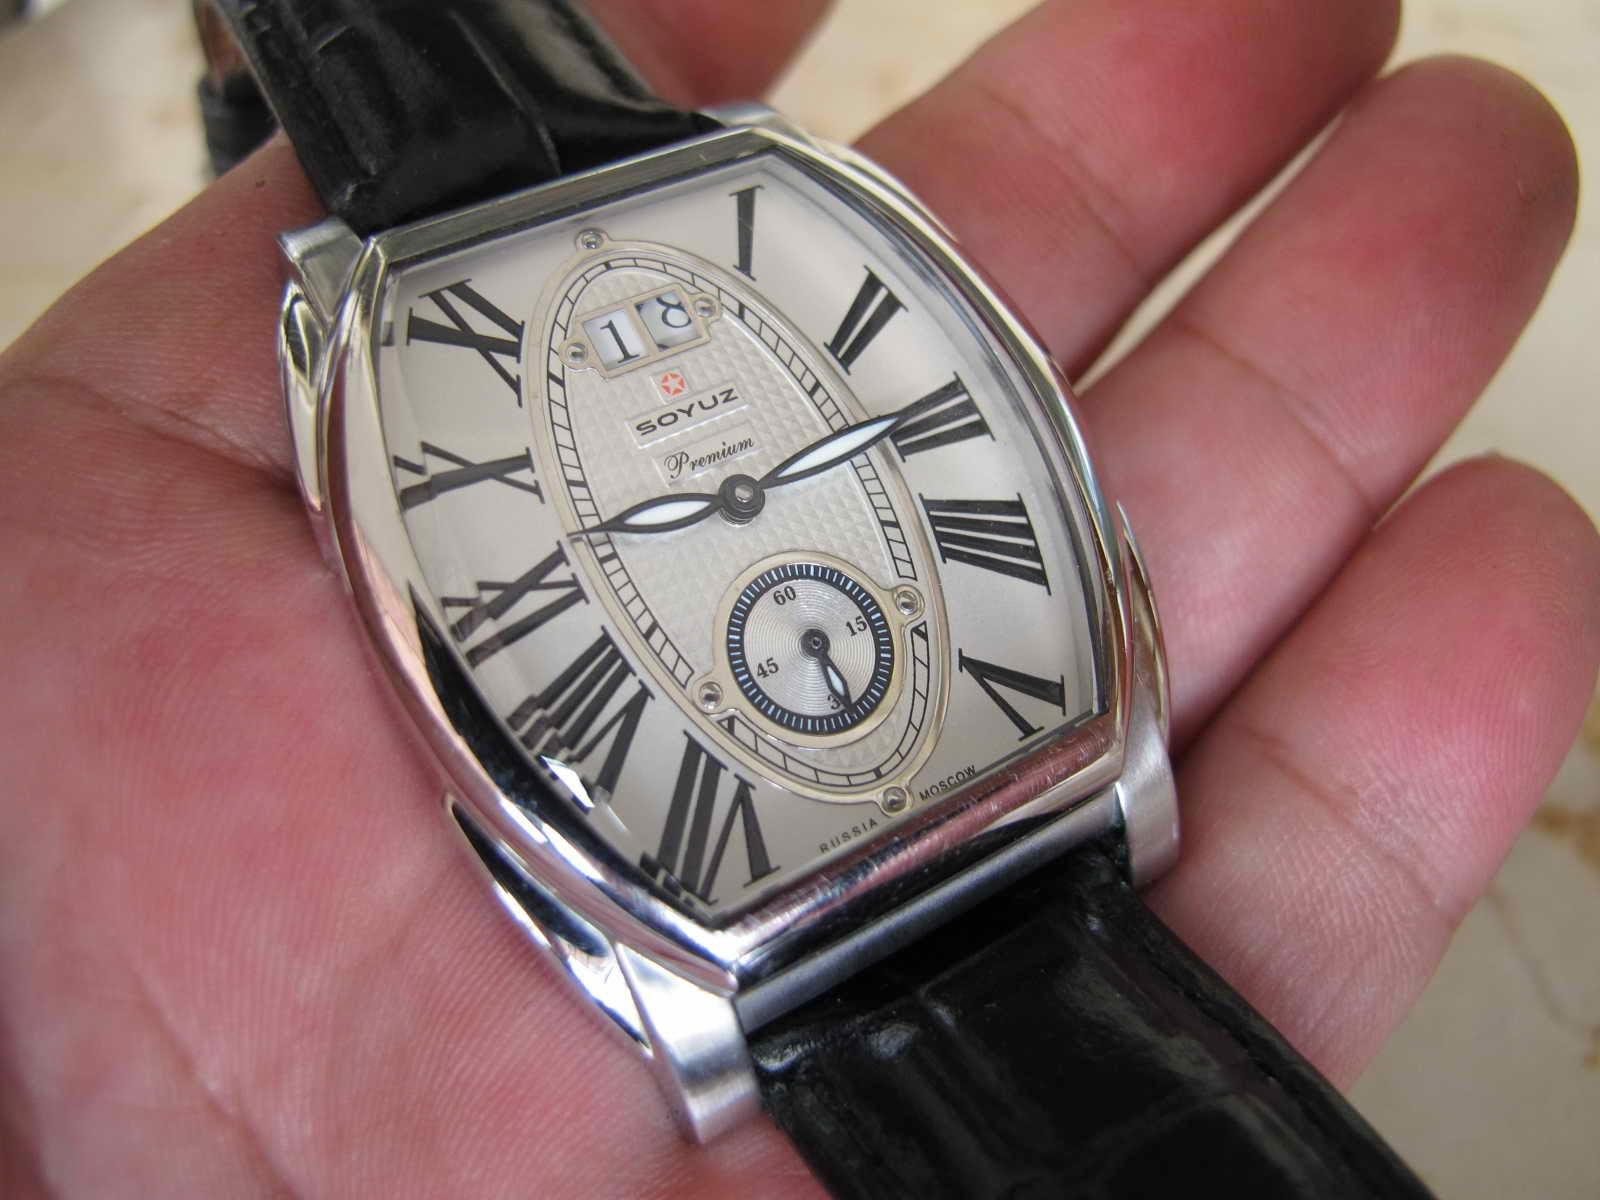 Cocok untuk Anda yang sedang mencari jam tangan dengan model case TONEAU Roman DIAL SOYUZ automatic